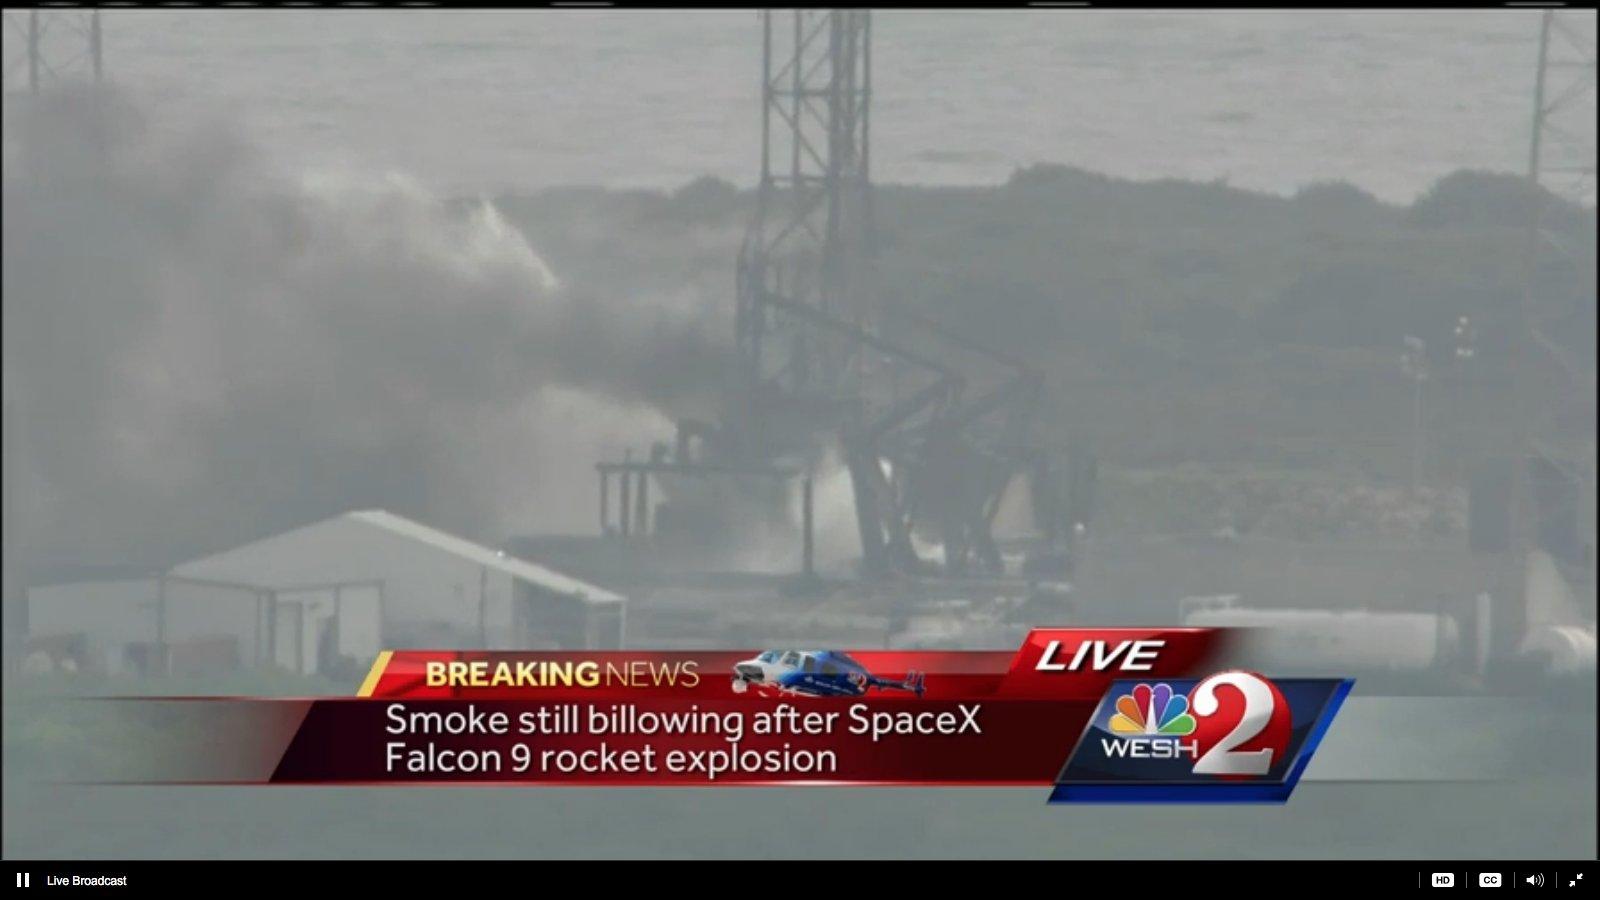 Космос: Ракета SpaceX взорвалась на стартовой площадке